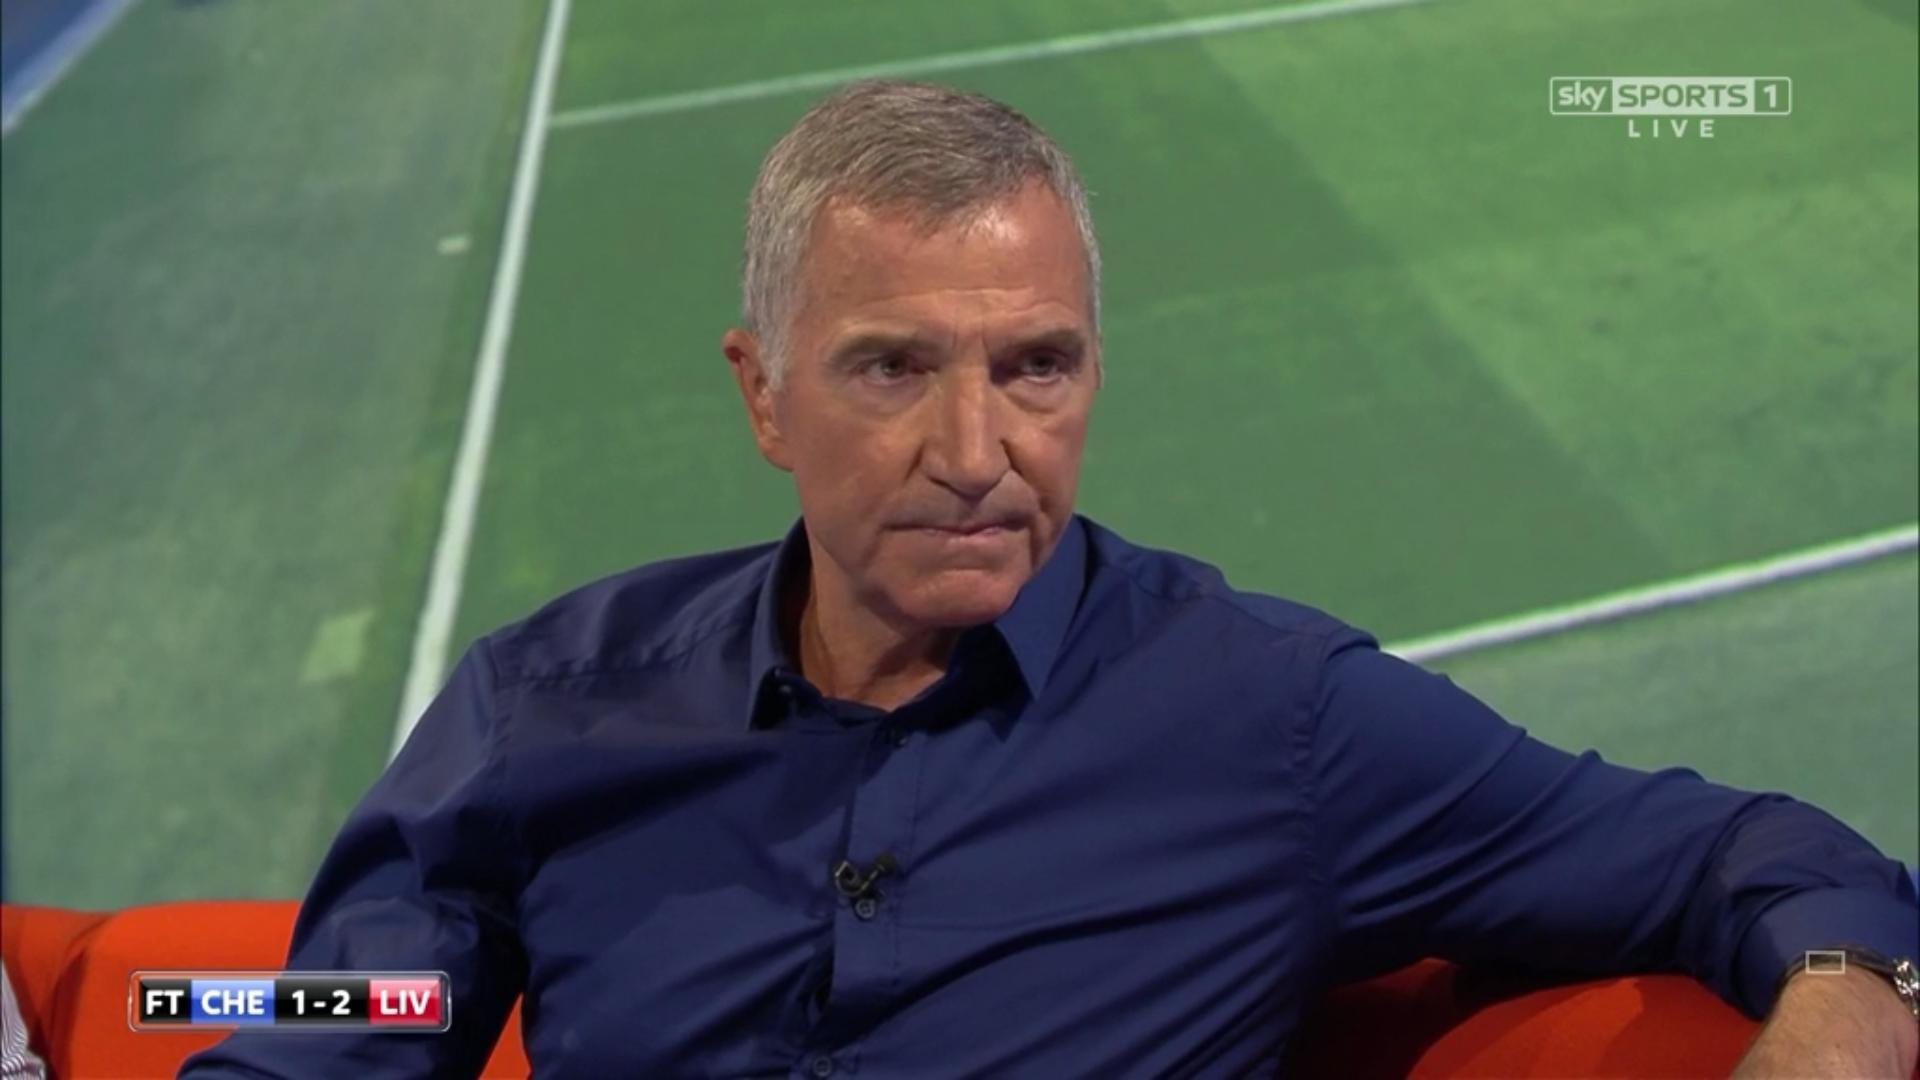 Graeme Souness - Sky Sports Football Commentator (2)